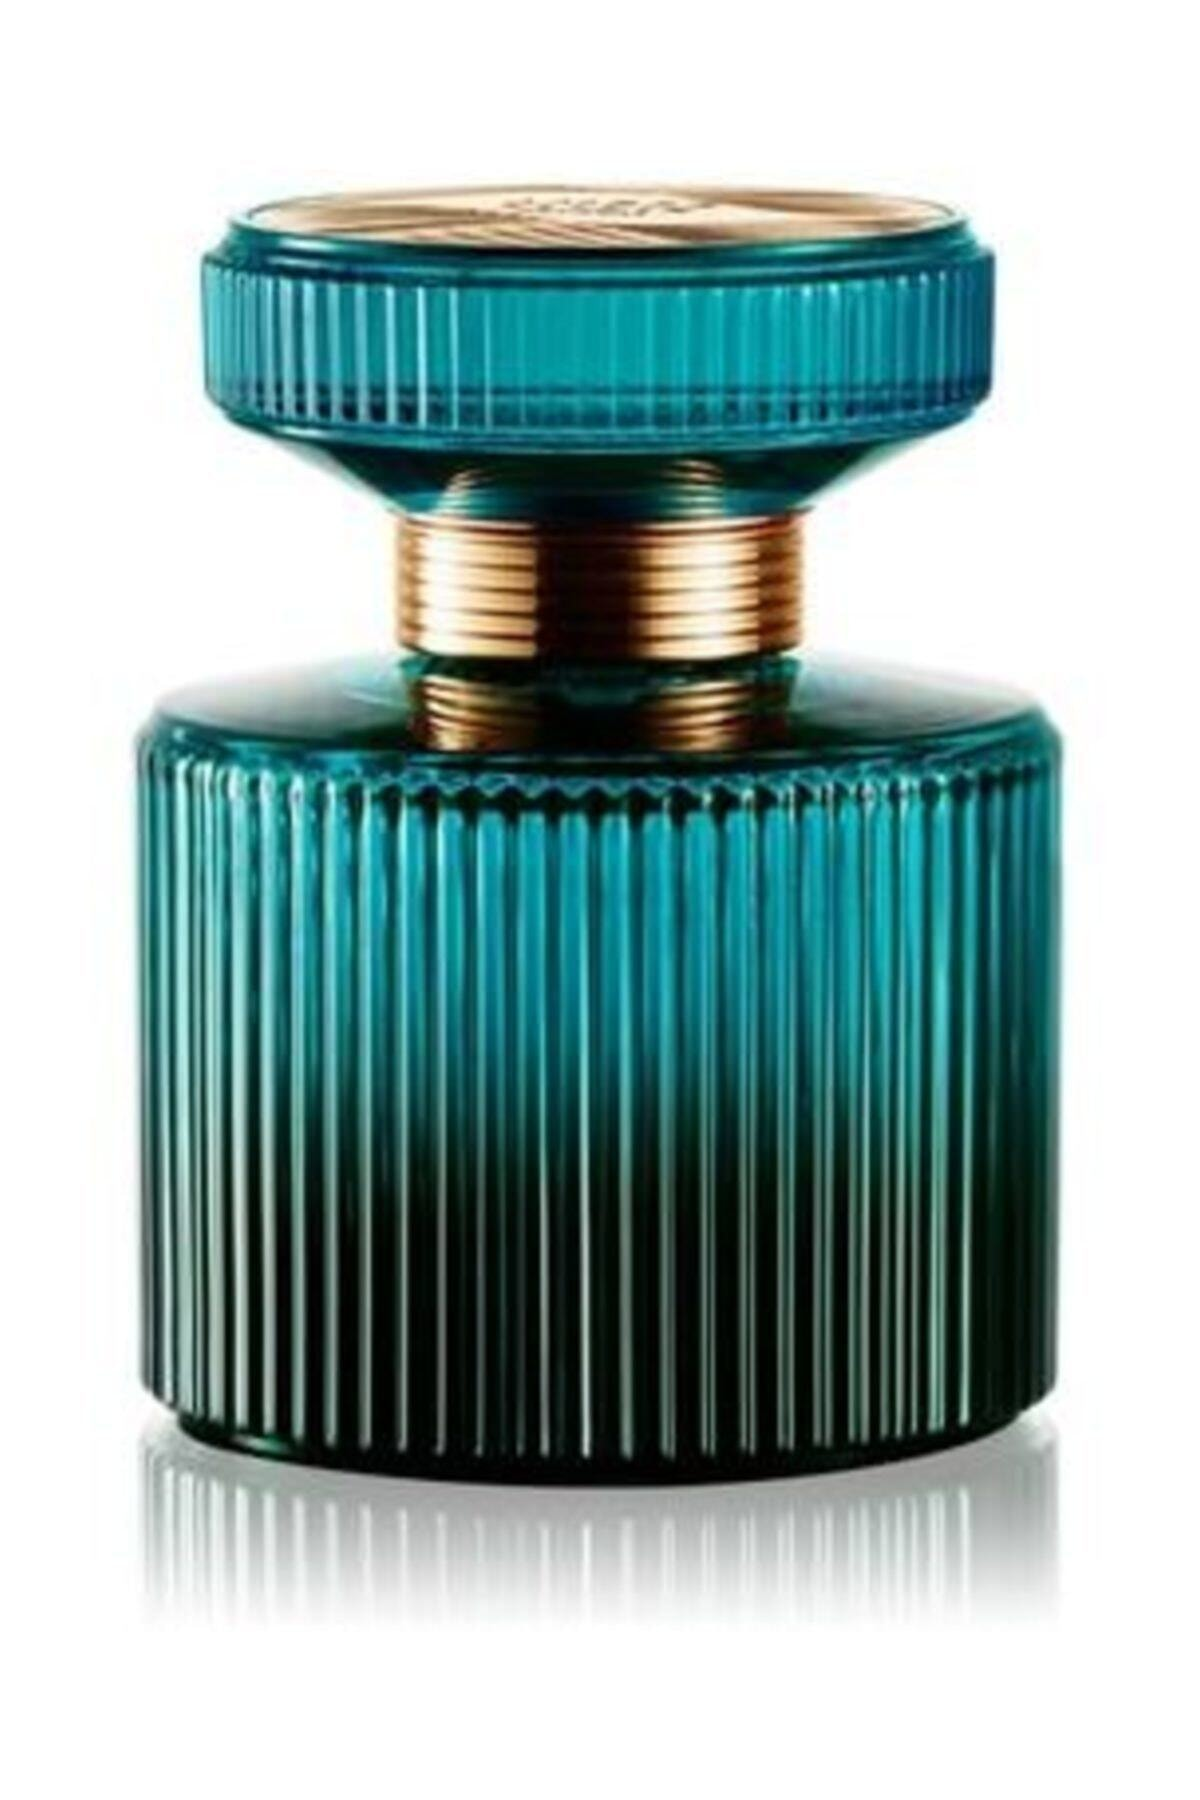 Amber Elixir Crystal Edp 50 ml Women 'S Perfume Permanent Impressive Sexi Fragrance New Season Care Gift for Women 2021 недорого